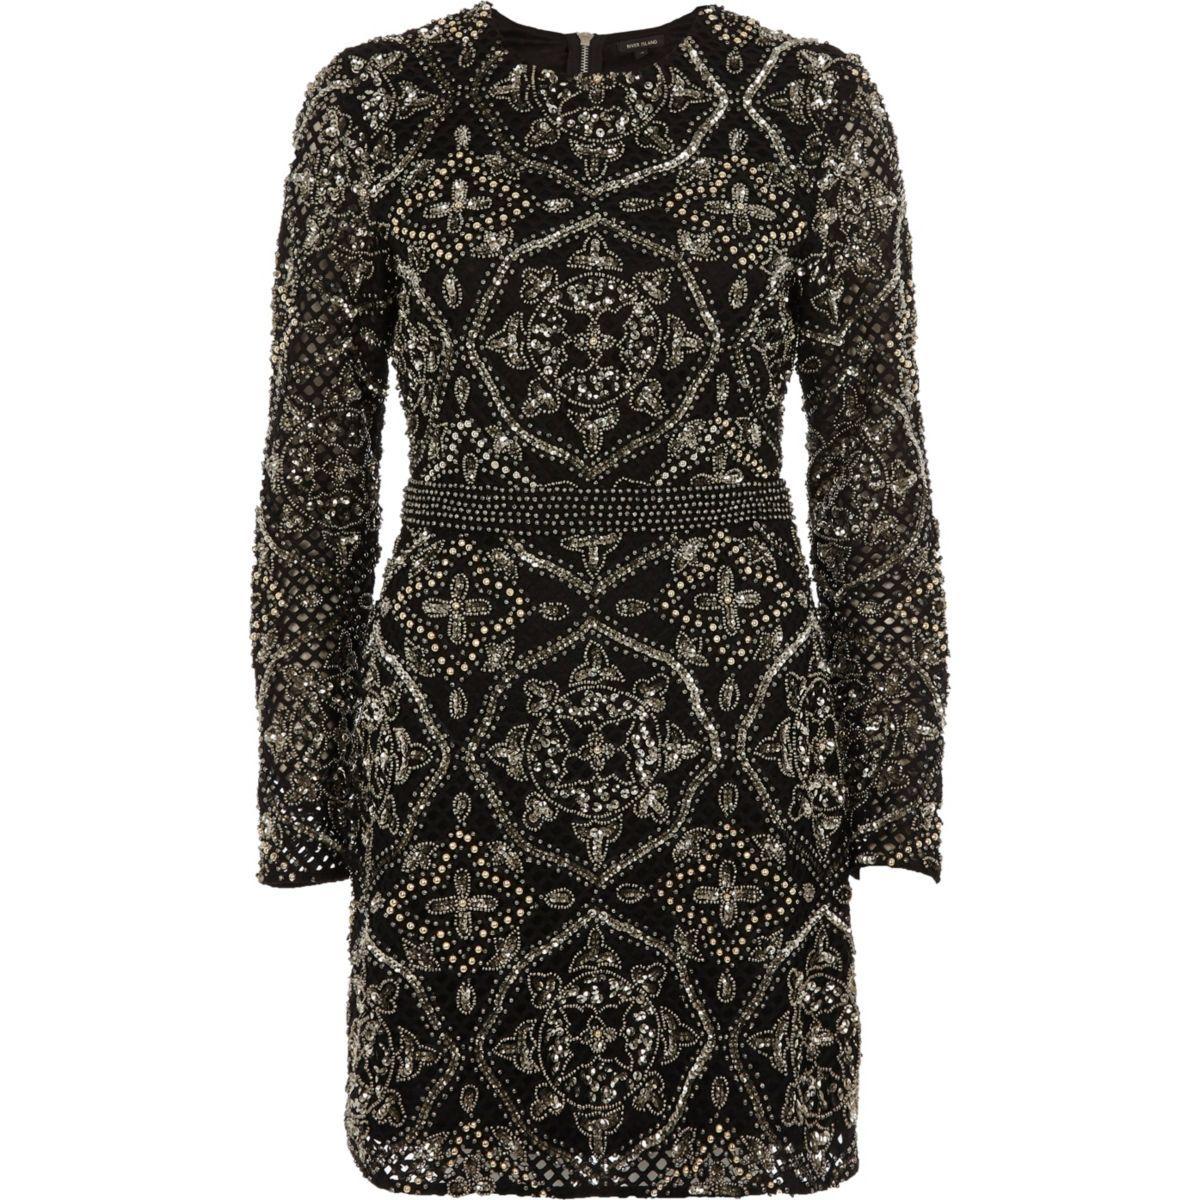 c6dd3542de Black sequin embellished bodycon mini dress - Swing Dresses - Dresses -  women